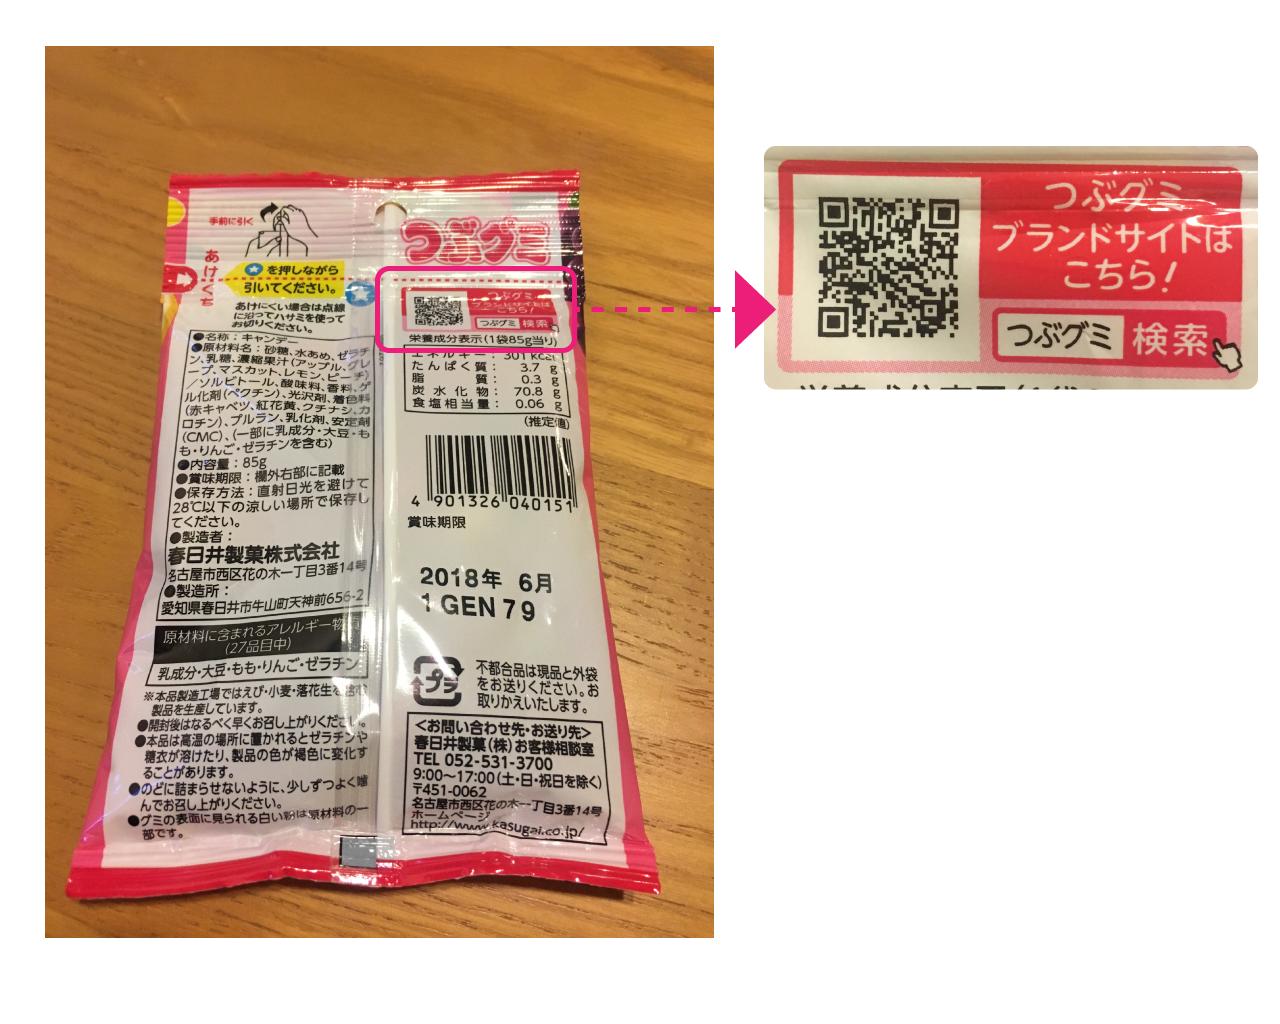 iphone-ipad-ios11-qr-code-camera-loading-2